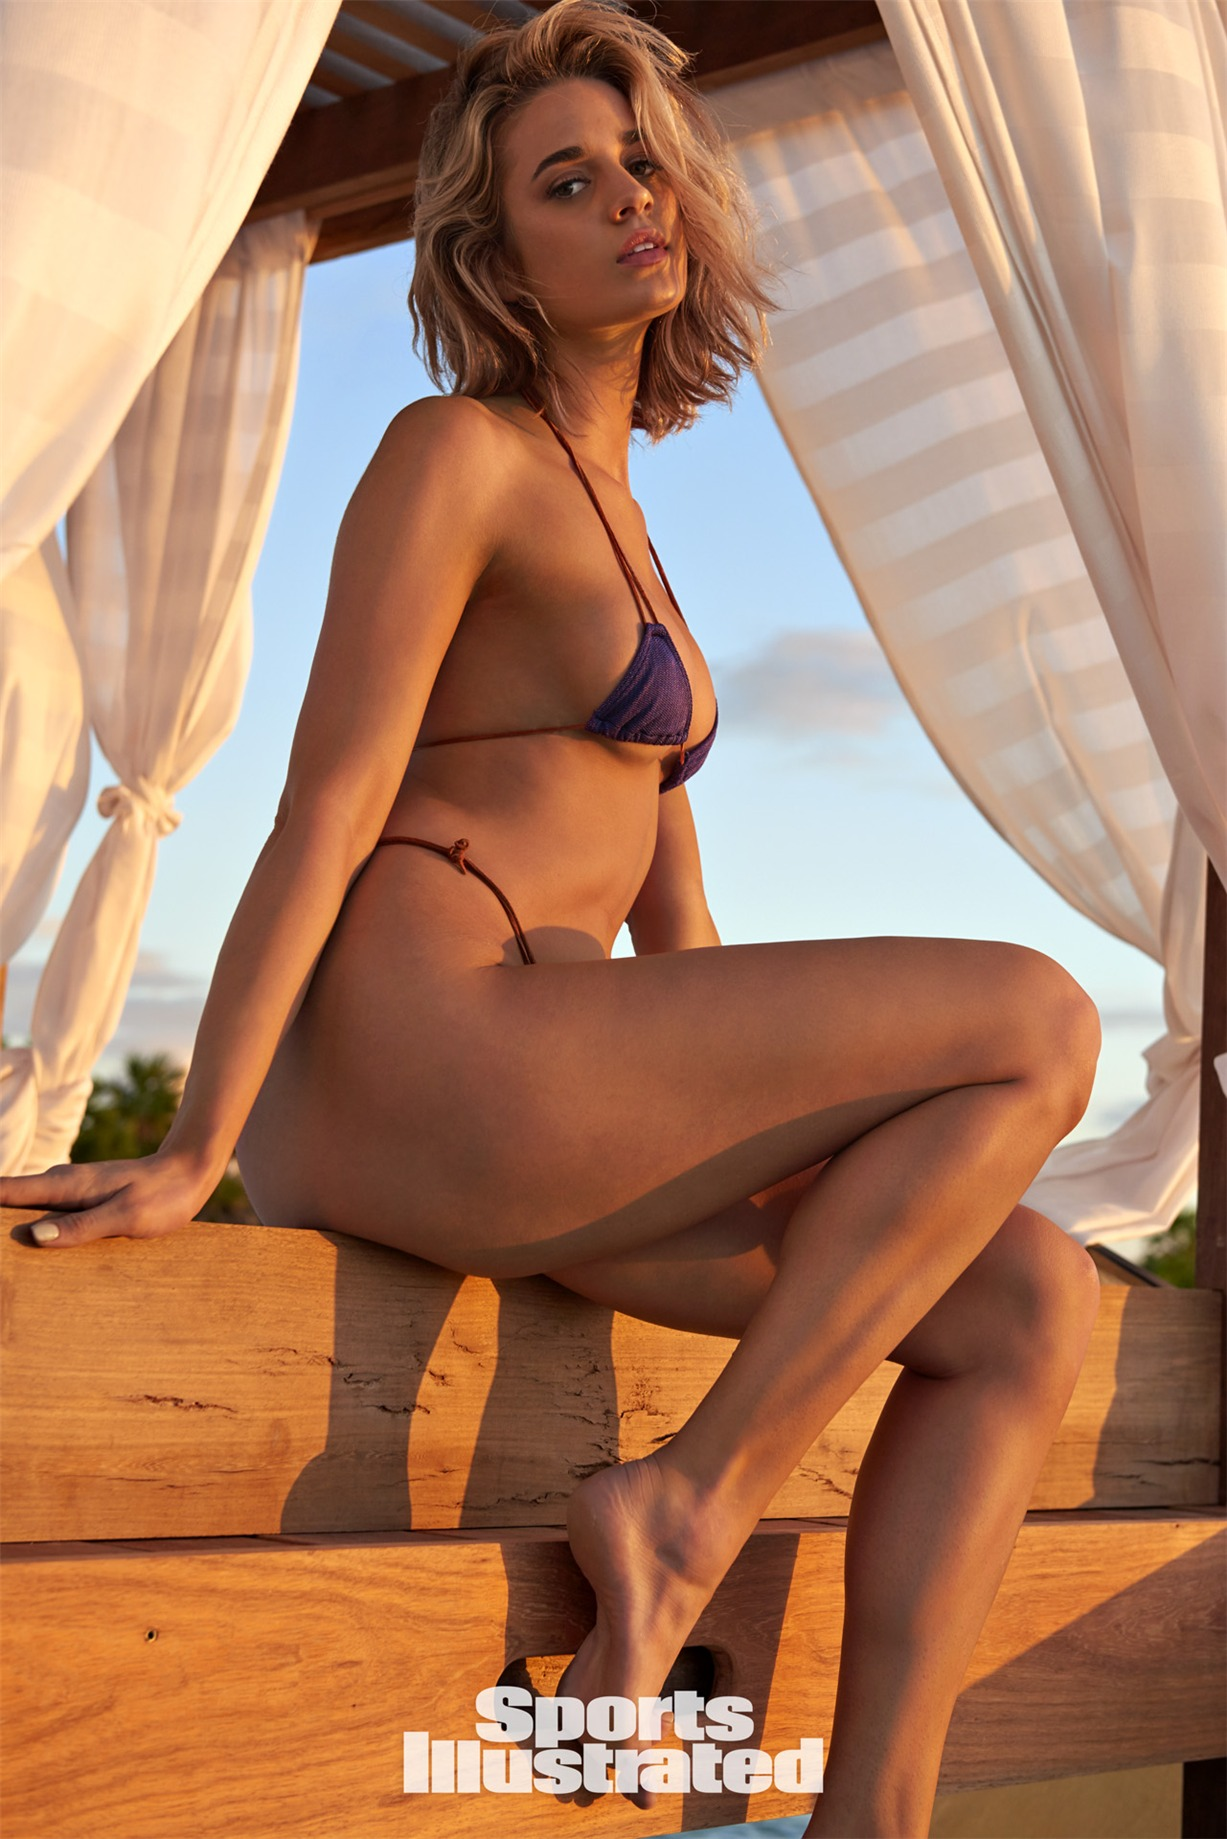 Allie Ayers / Элли Эйерс в купальниках из новой коллекции Sports Illustrated Swimsuit 2018 issue / in Belize by Yu Tsai